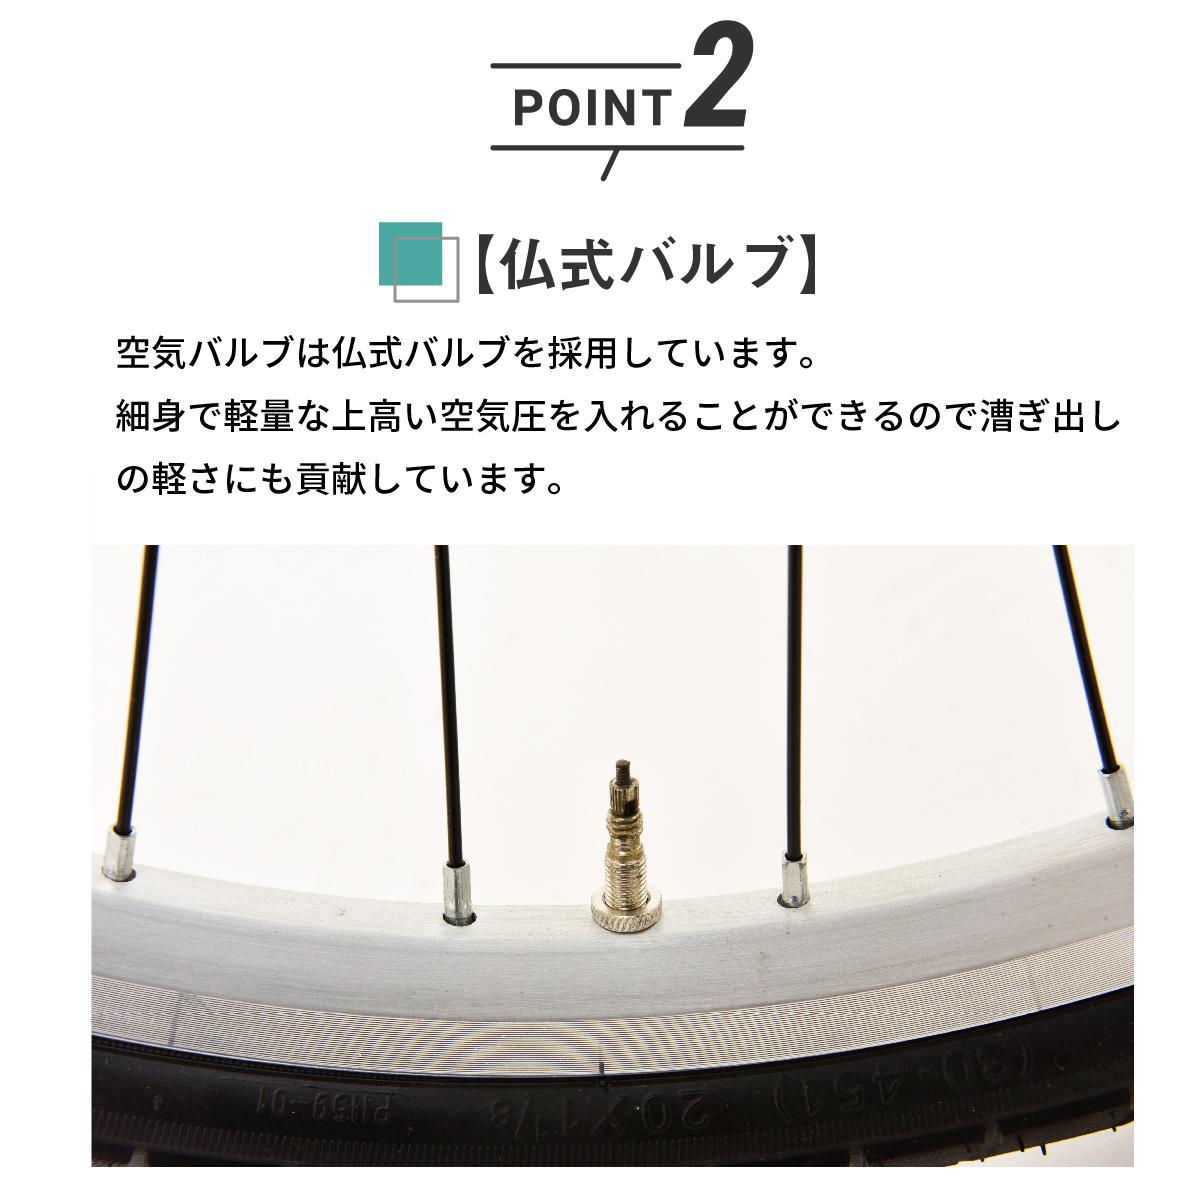 https://www.e-otomo.co.jp/wp-content/uploads/2021/06/nx-mx901-point-07.jpg